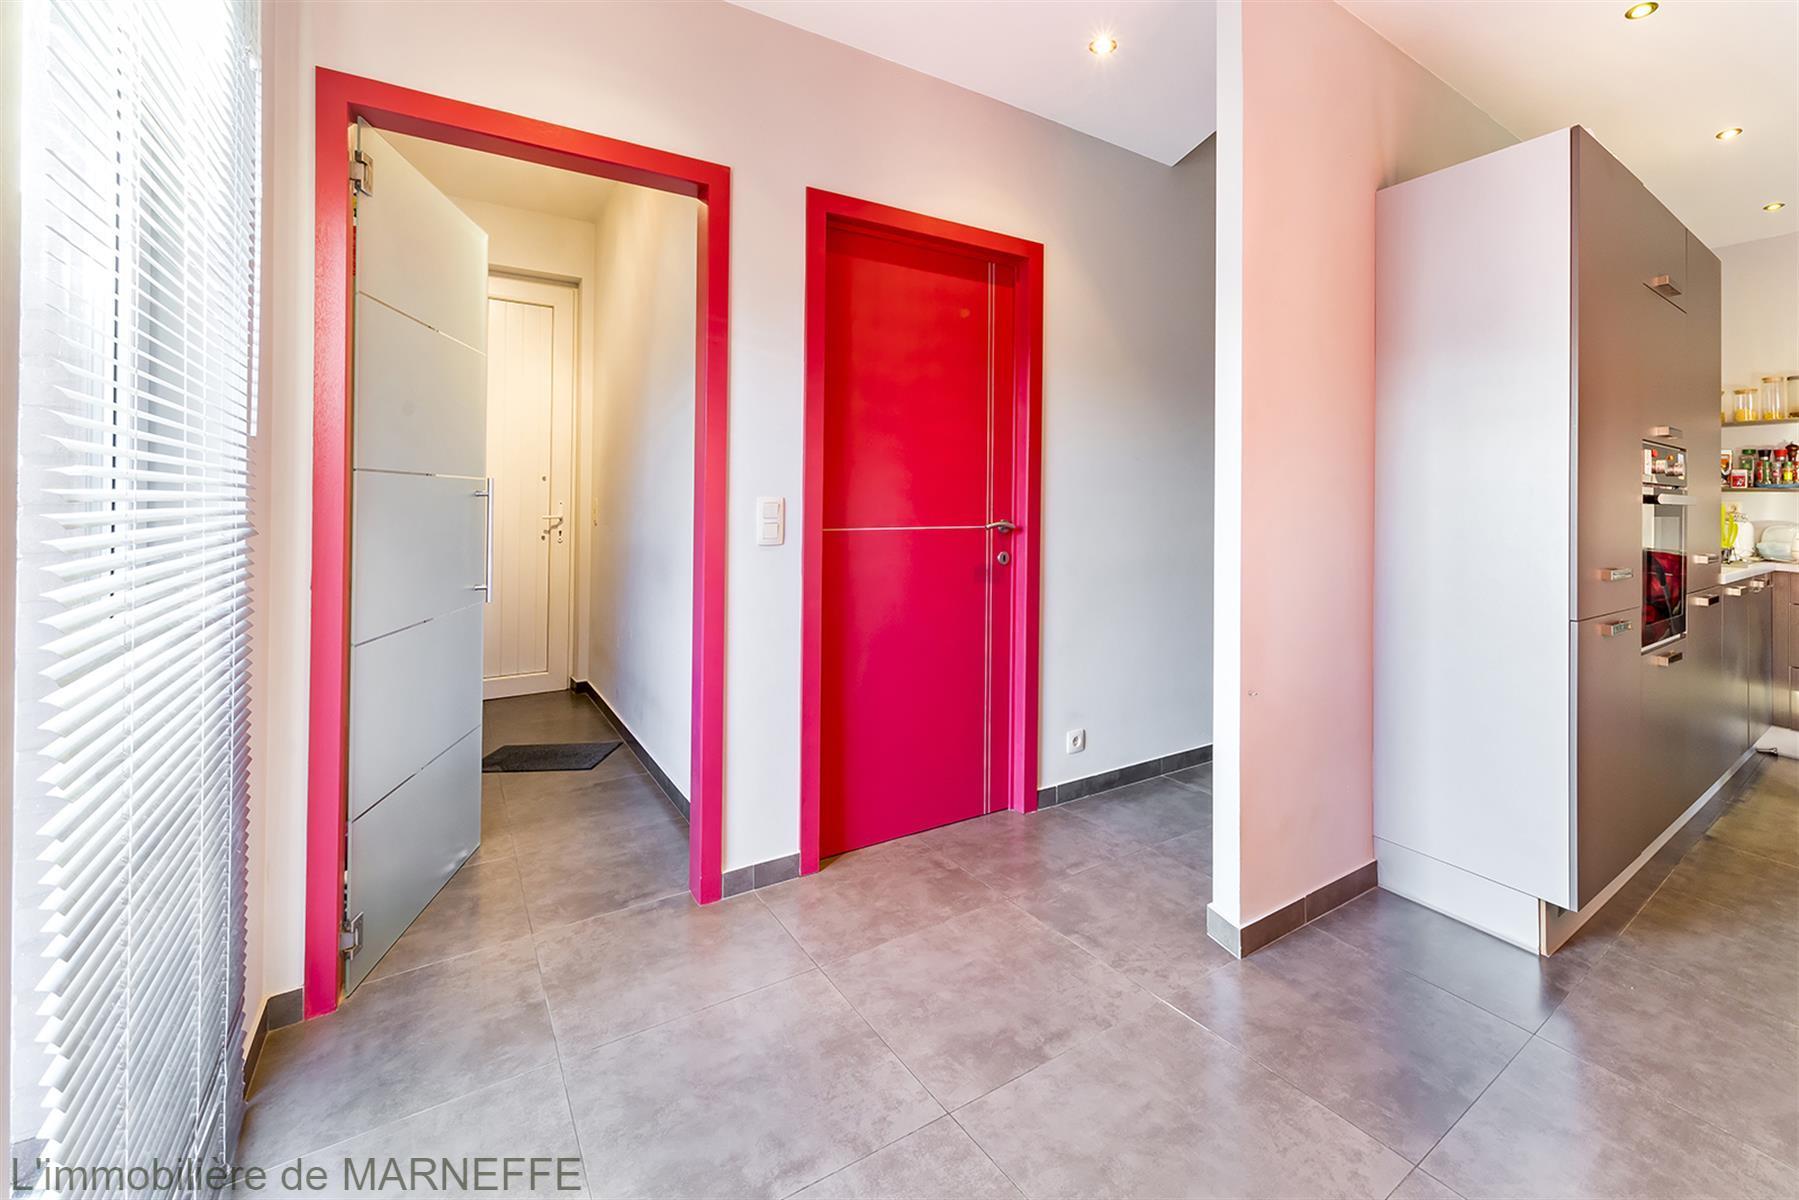 Appartement avec jardin - Orp-Jauche - #3625402-9